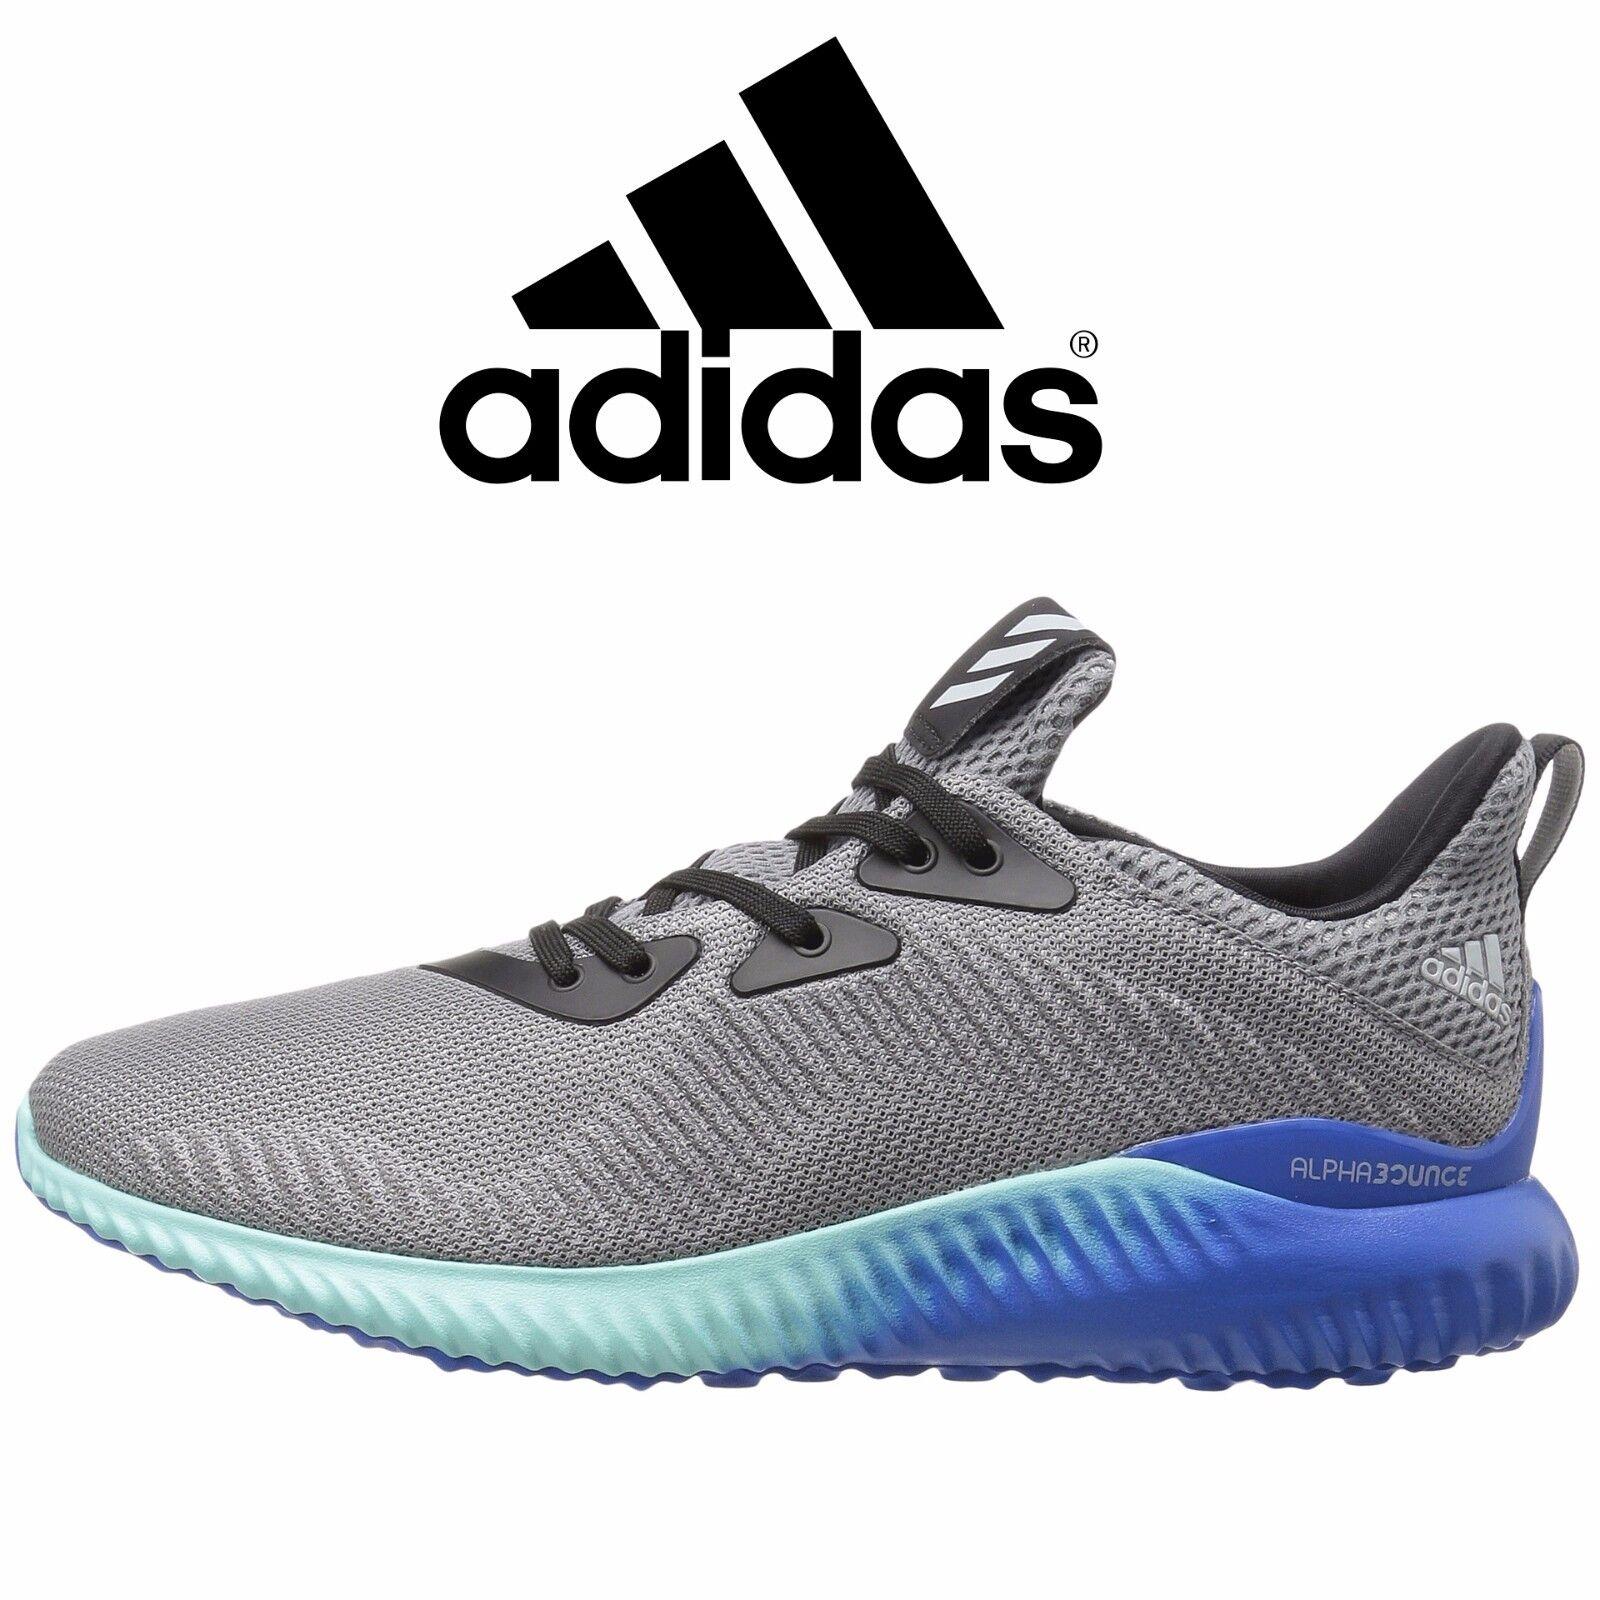 Mens Adidas AlphaBOUNCE Running Shoes Grey Onix Aqua All Sizes NEW